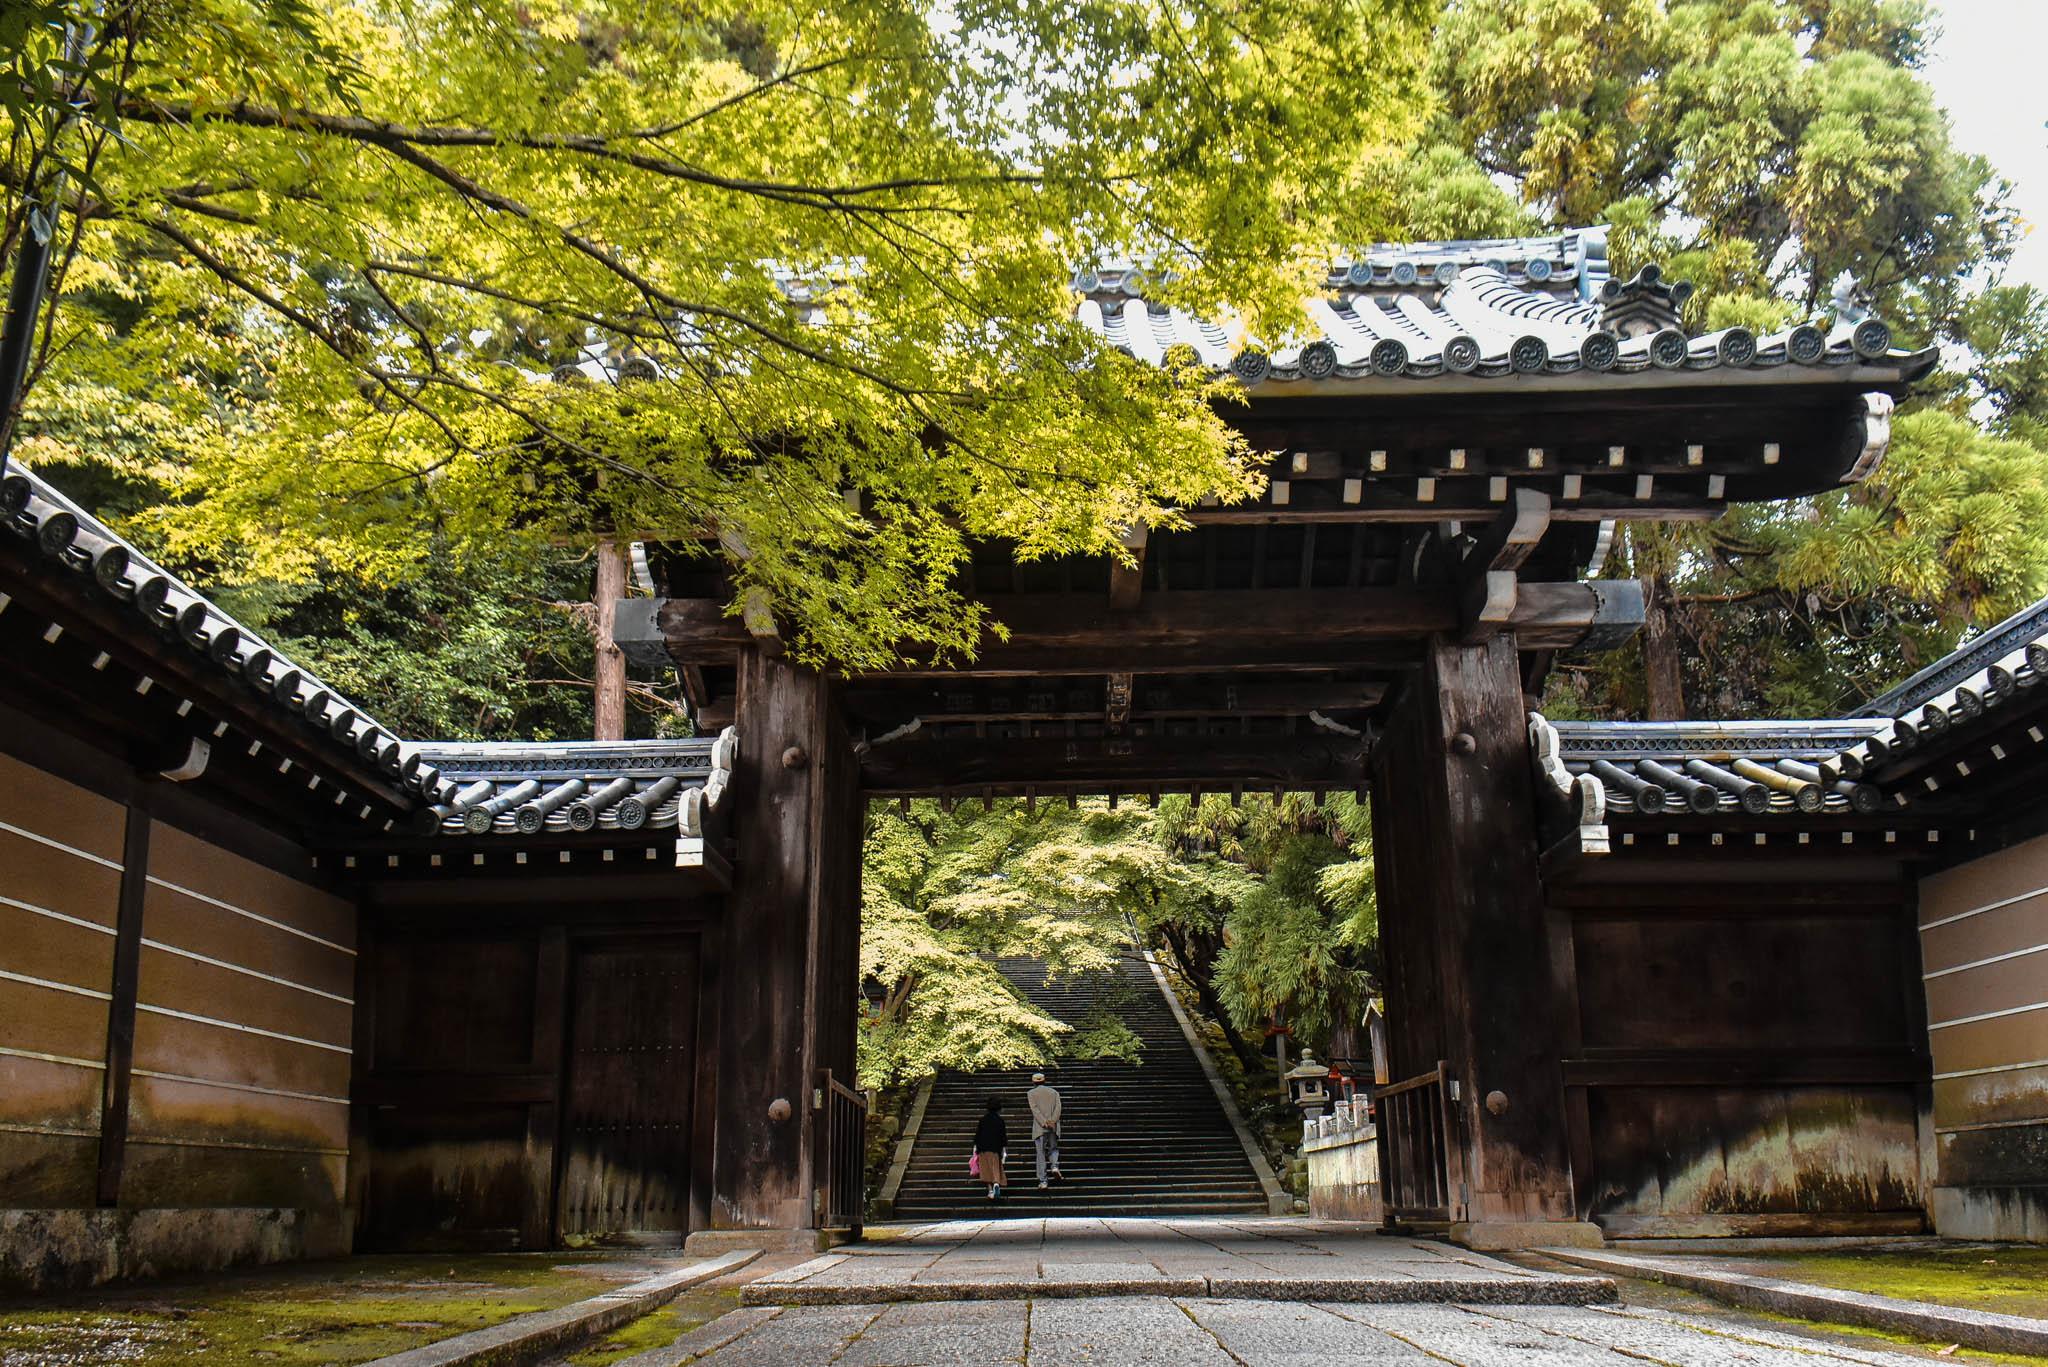 kyoto 49 (1 of 1)